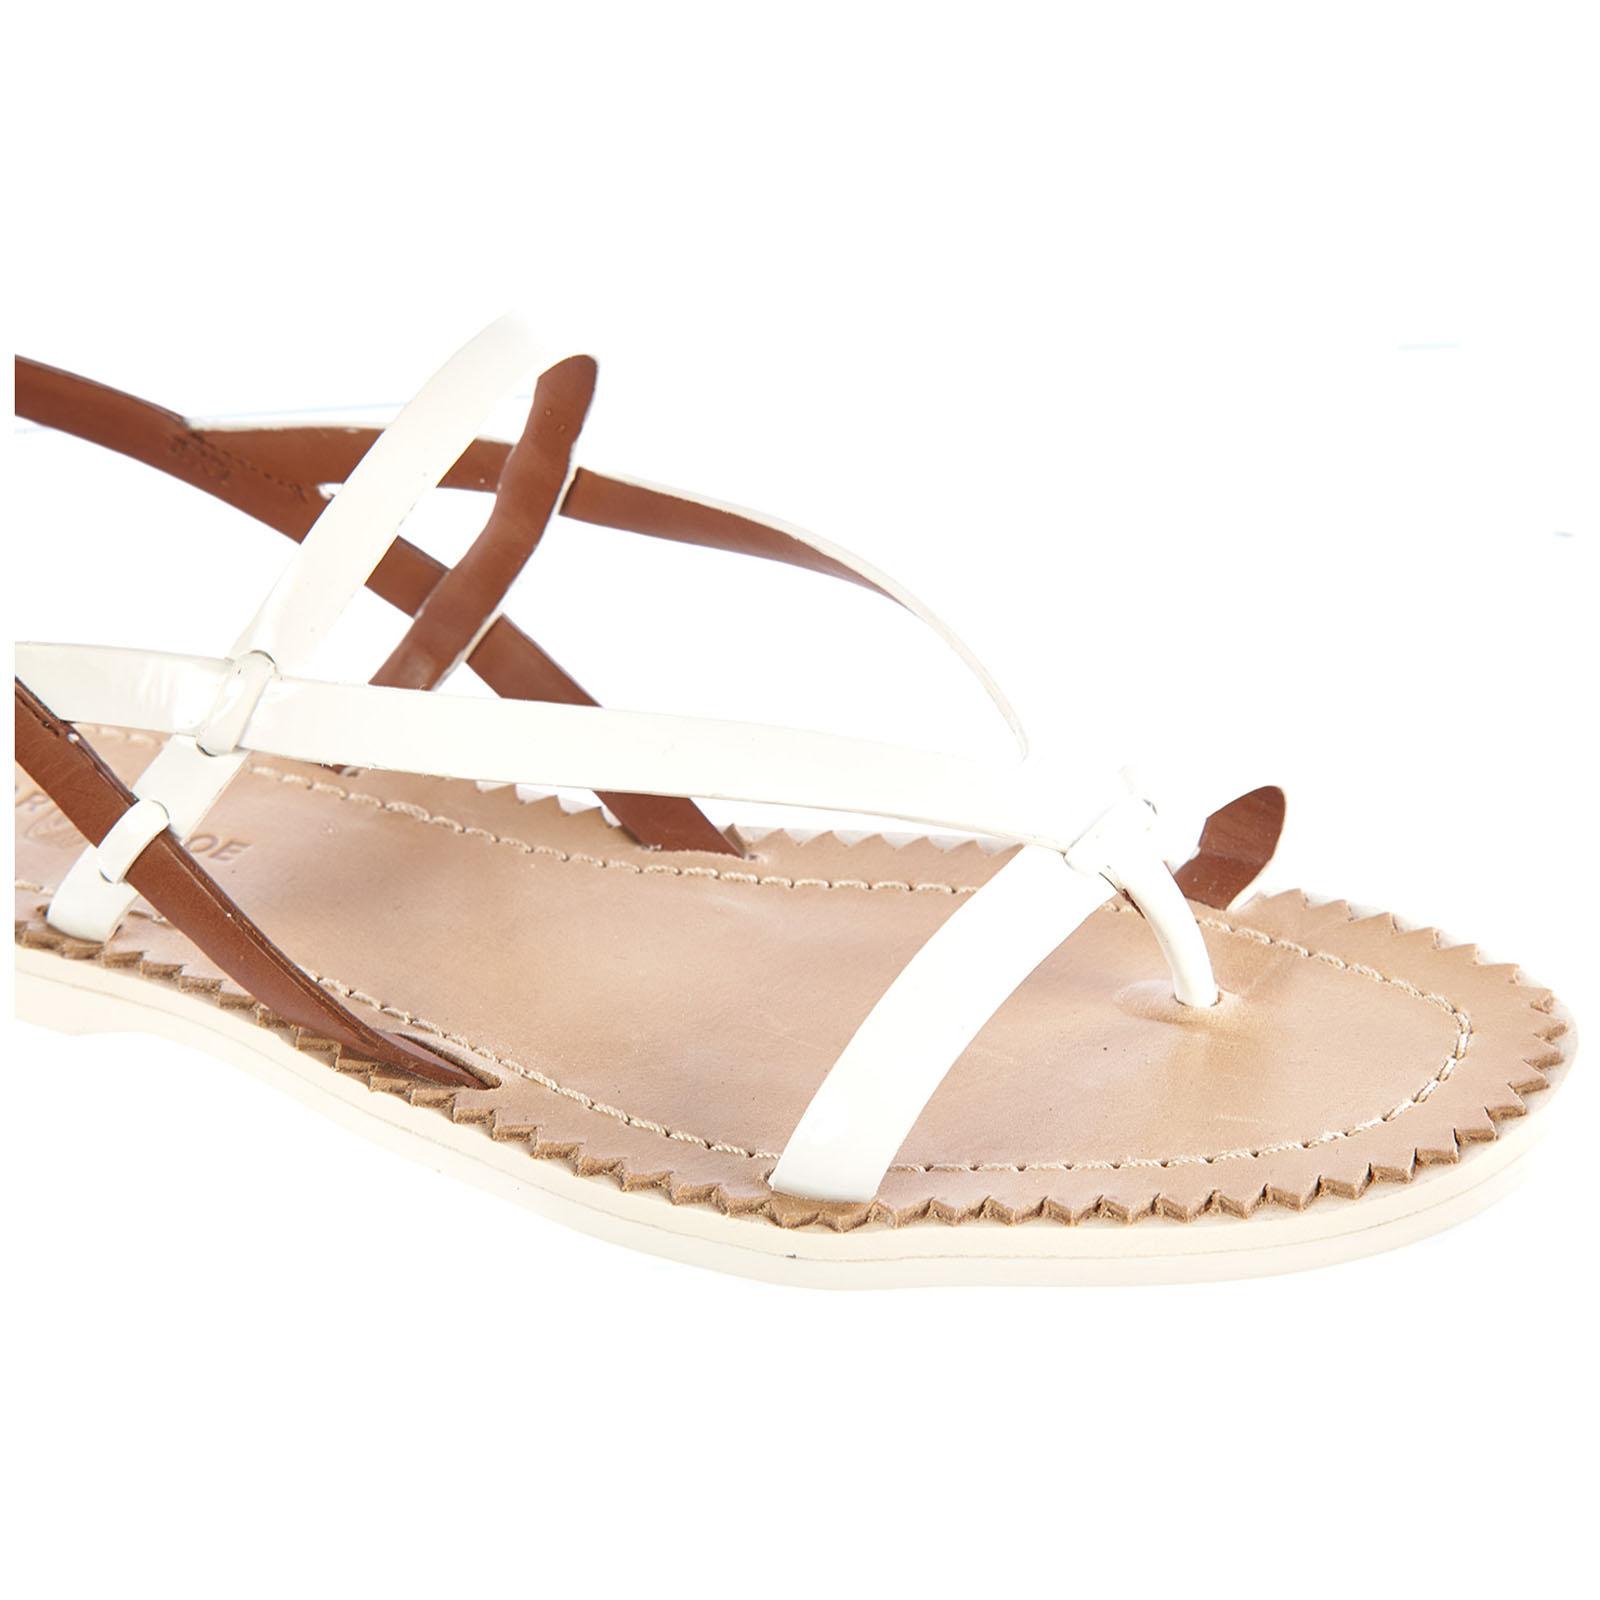 Sandalias mujer en piel  vernice